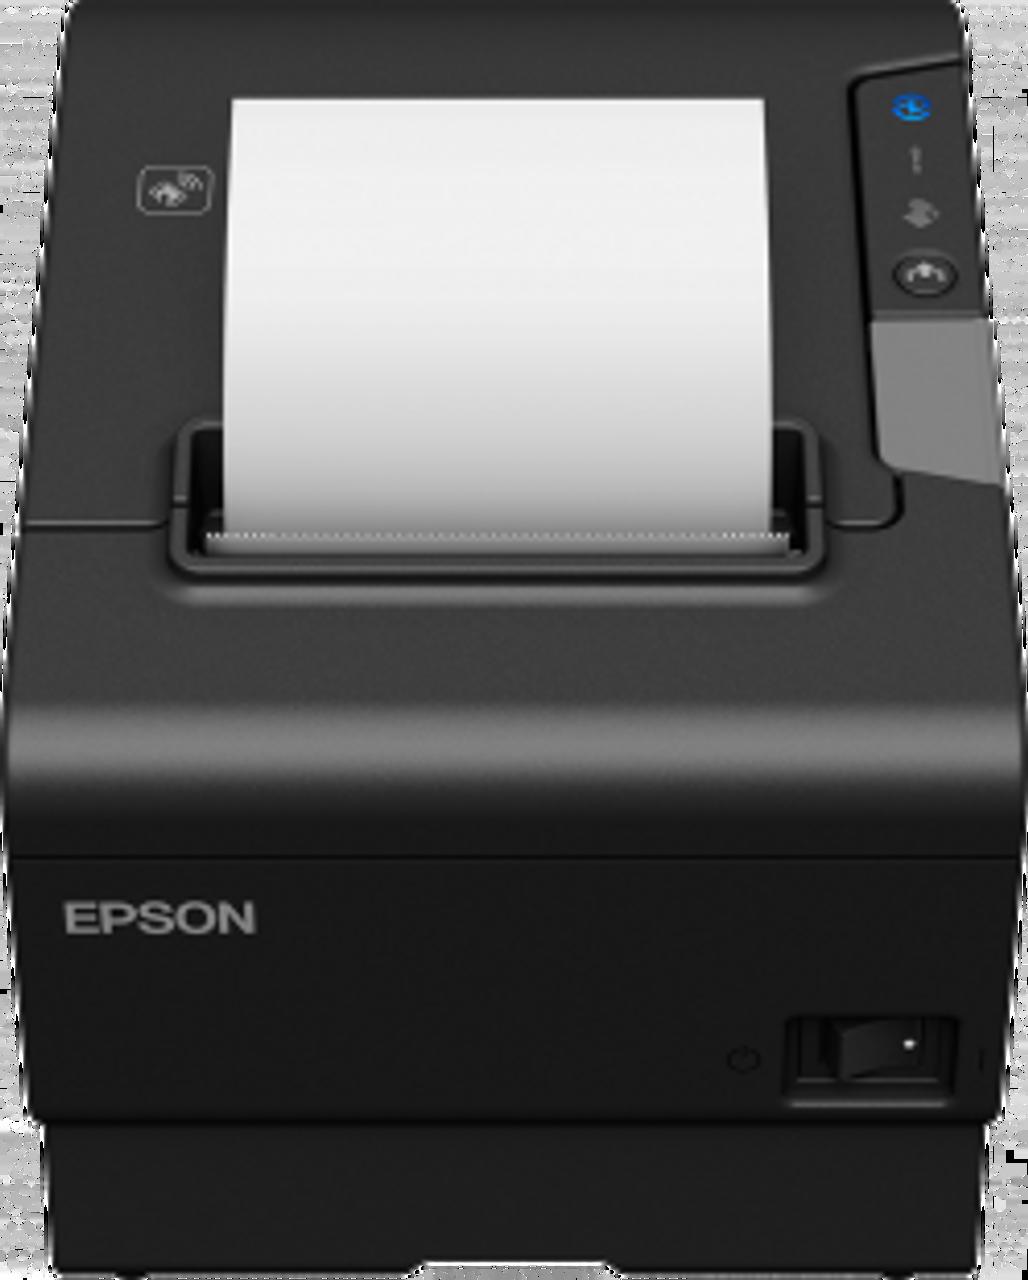 Epson TM-T88VI Printer